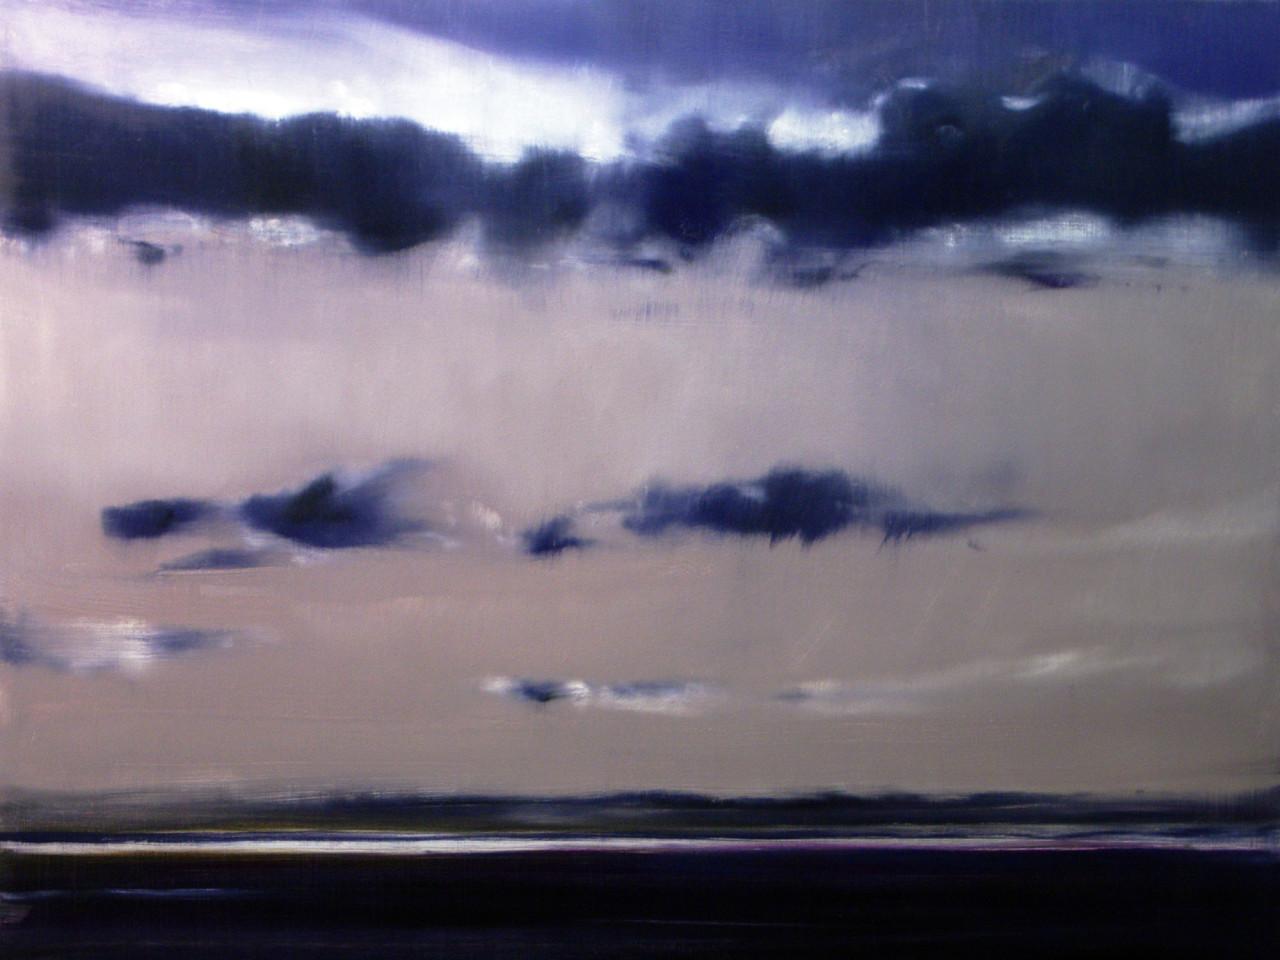 Riflesso nel fiume Serio, 2012, olio su tela 113x85 cm